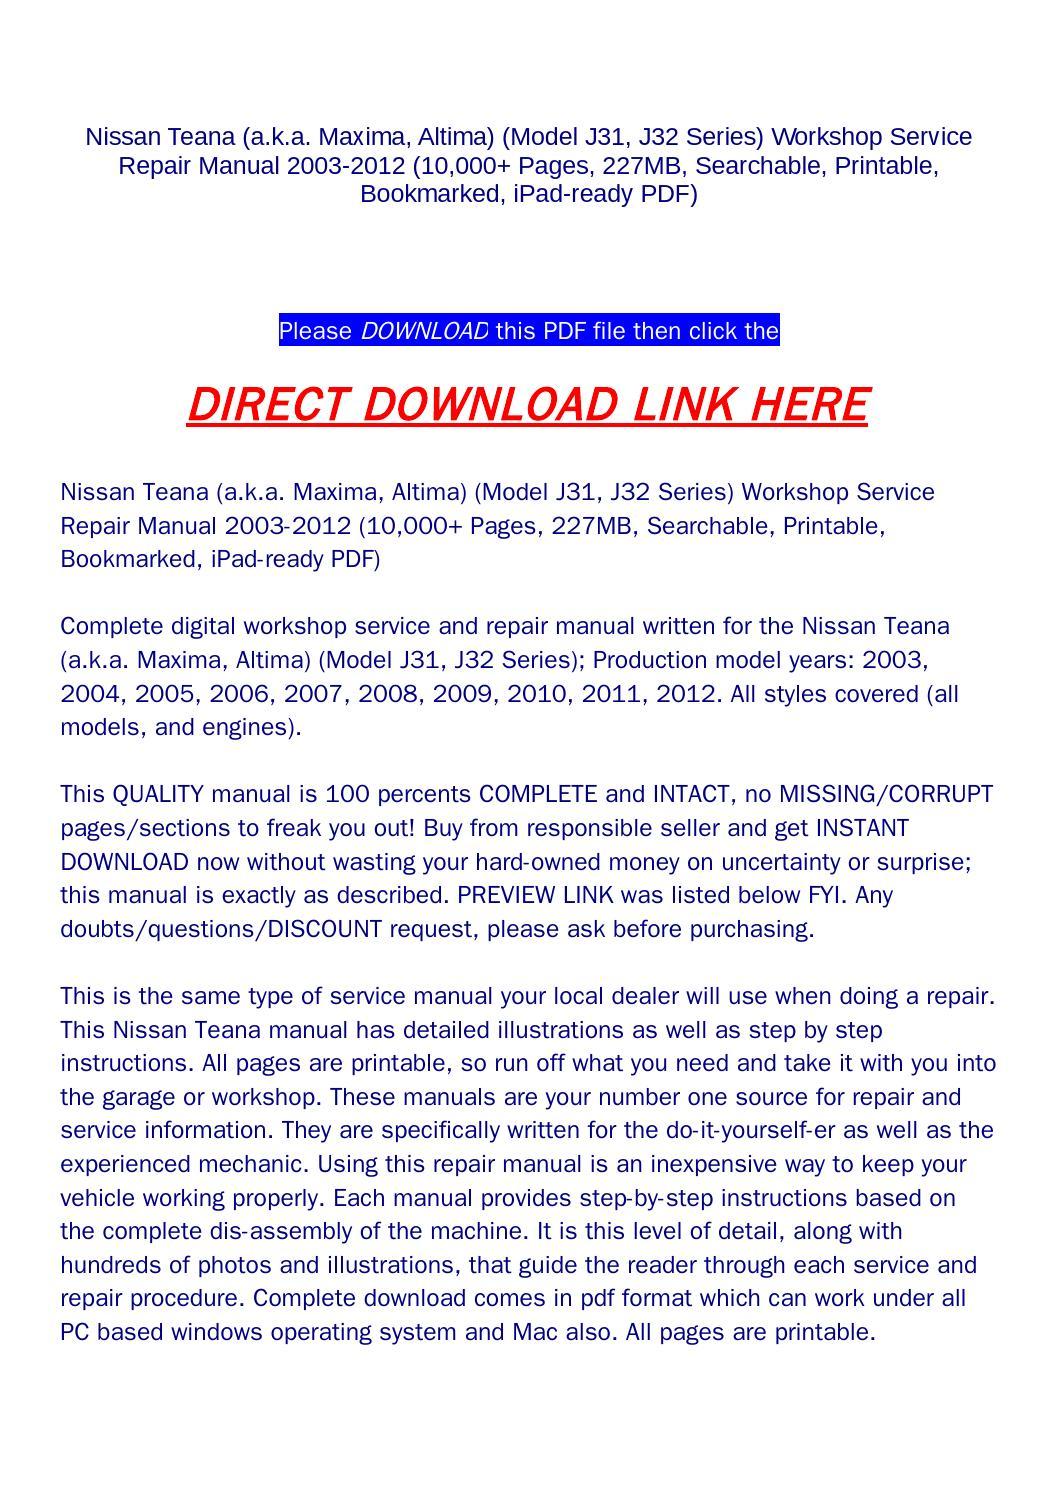 nissan teana 230jk owners manual